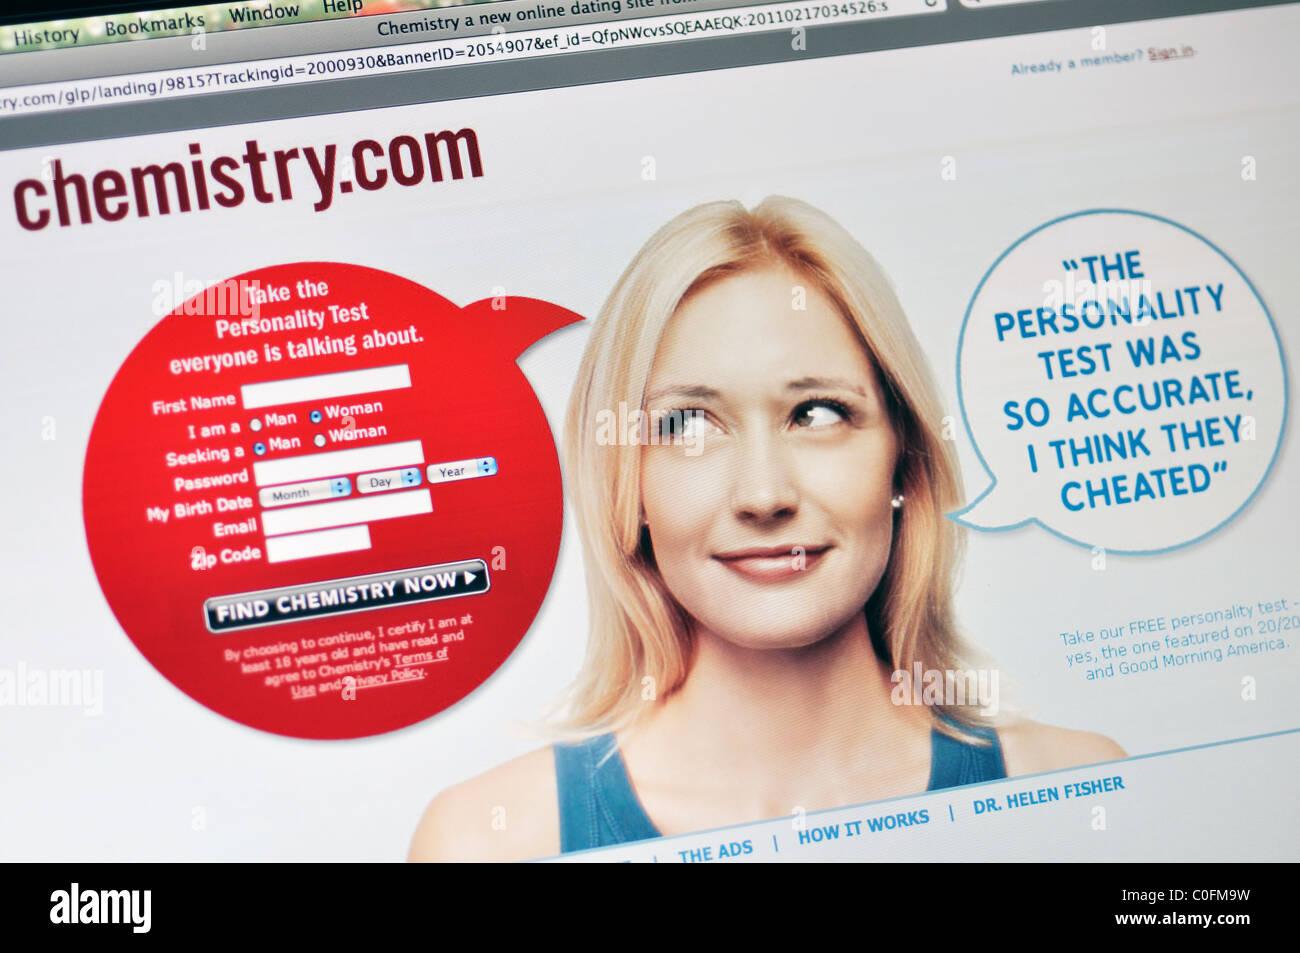 Chemisty dating site